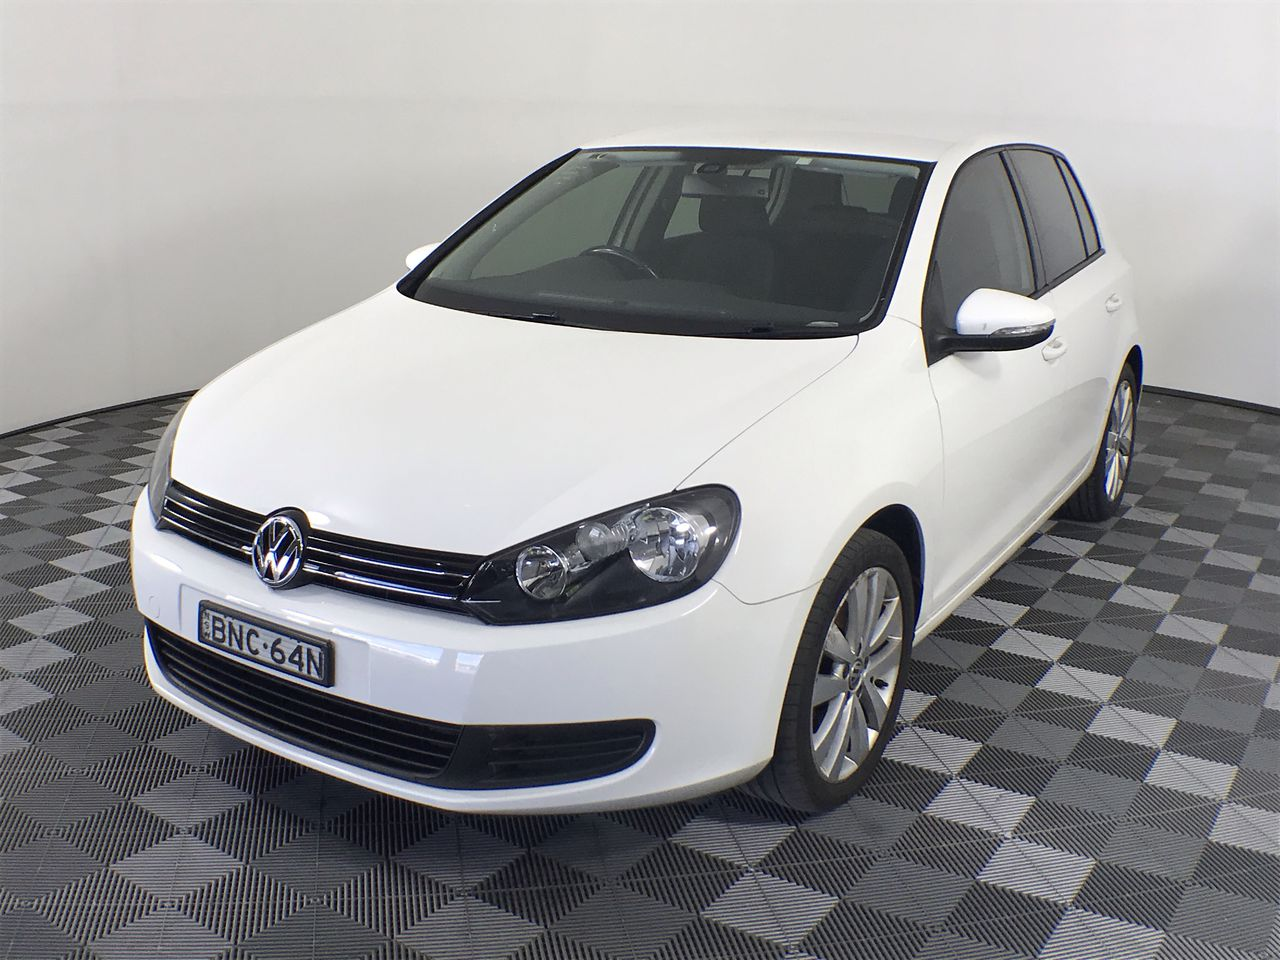 2009 Volkswagen Golf 118TSI Comfortline A6 Automatic Hatchback 97,609km